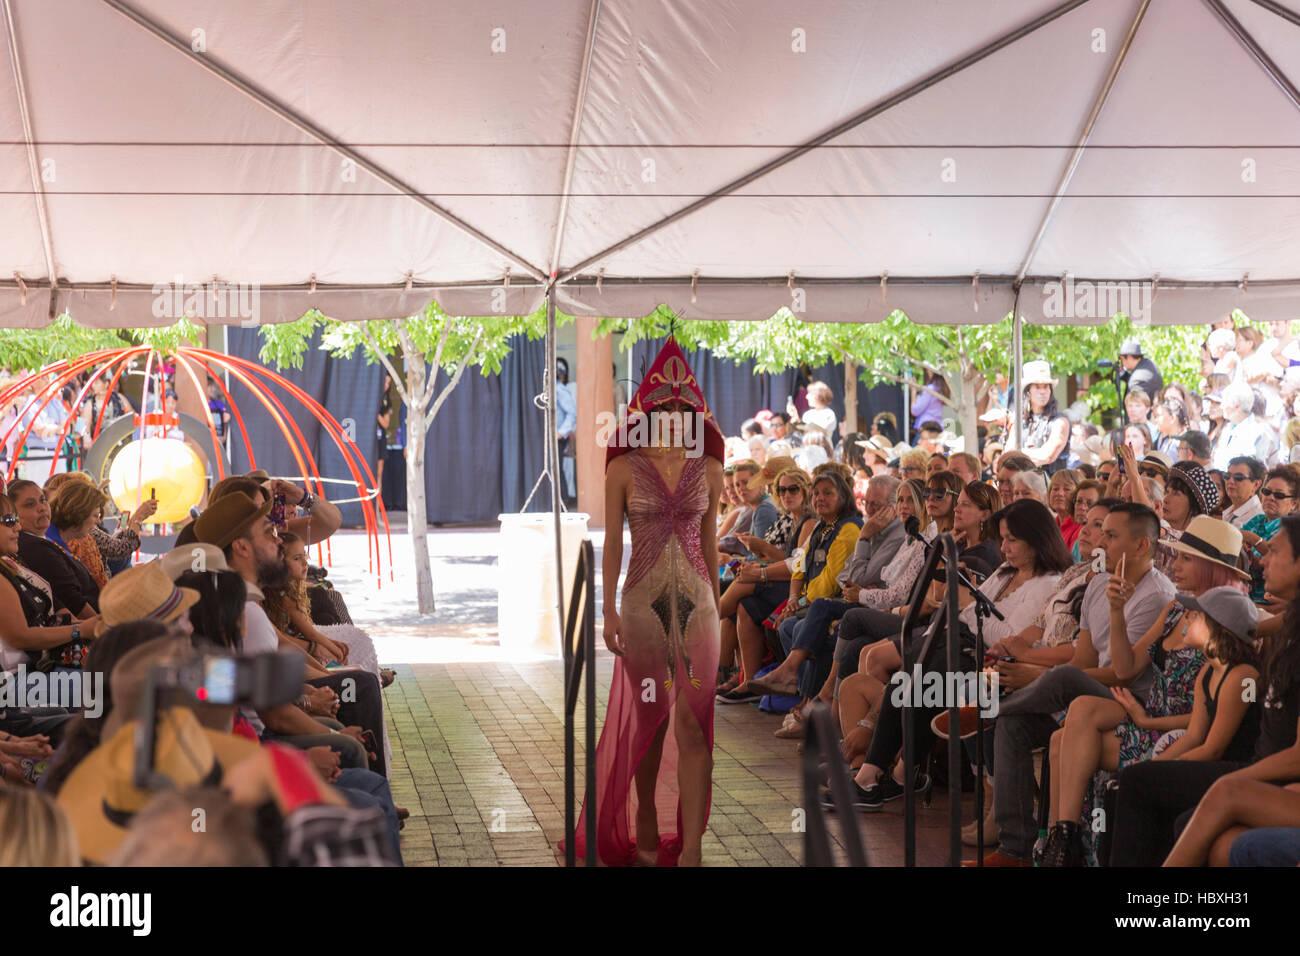 Haute Couture Fashion Show Santa Fe Indian Market 2016 Santa Fe, New Mexico, USA - Stock Image